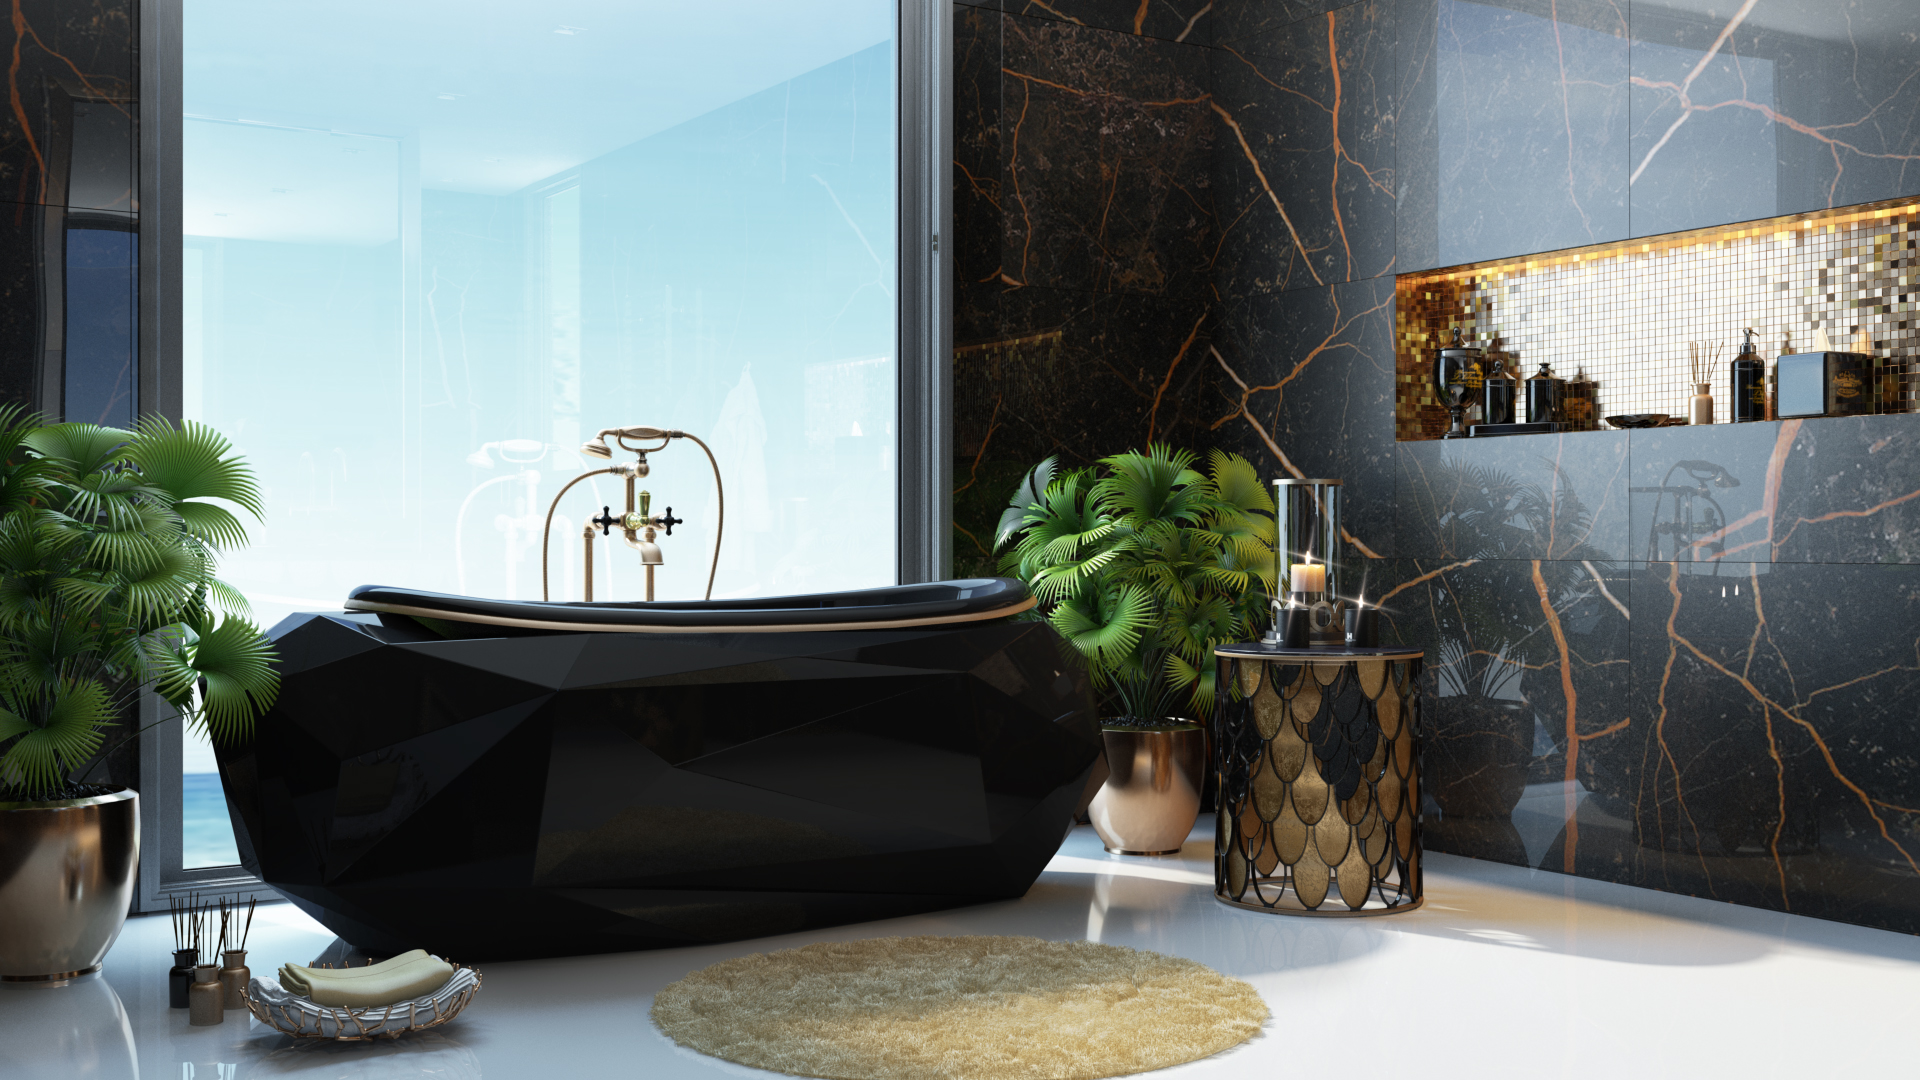 3D Render for an Edgy Bathroom Design